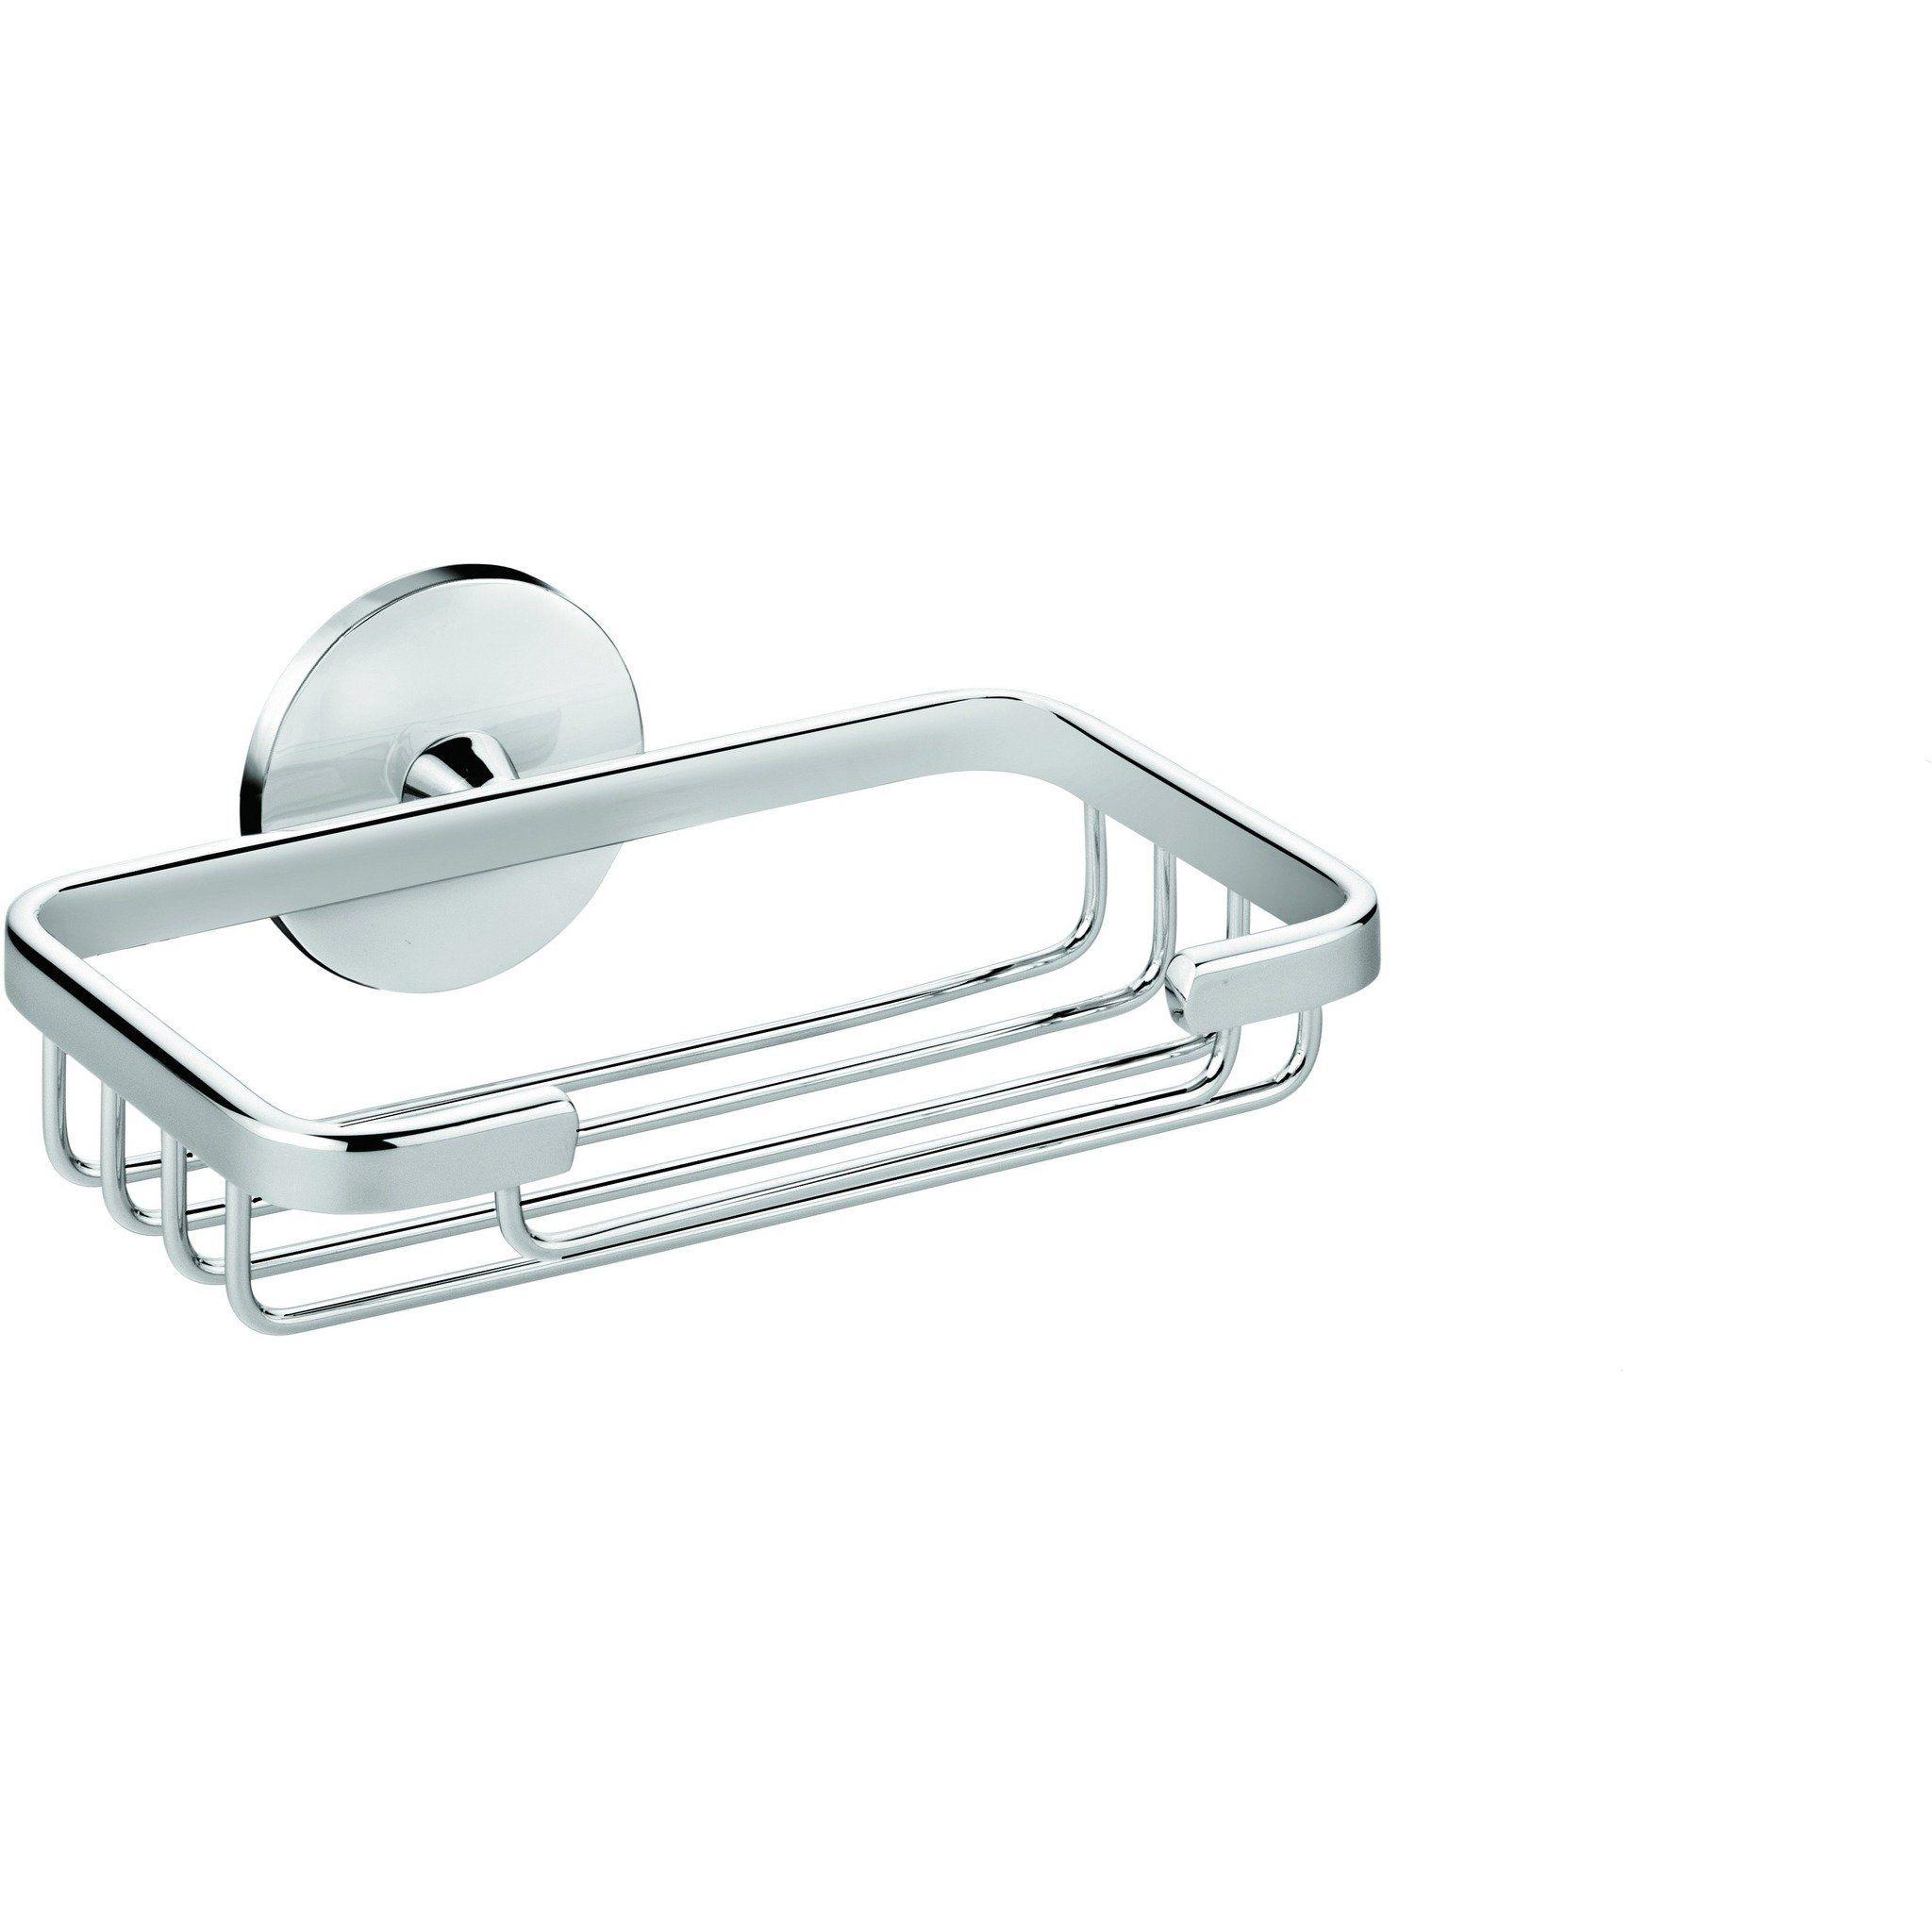 Soap Dish Shower Sponge Shelf Container Bath Deco Home Holder Soap Dish